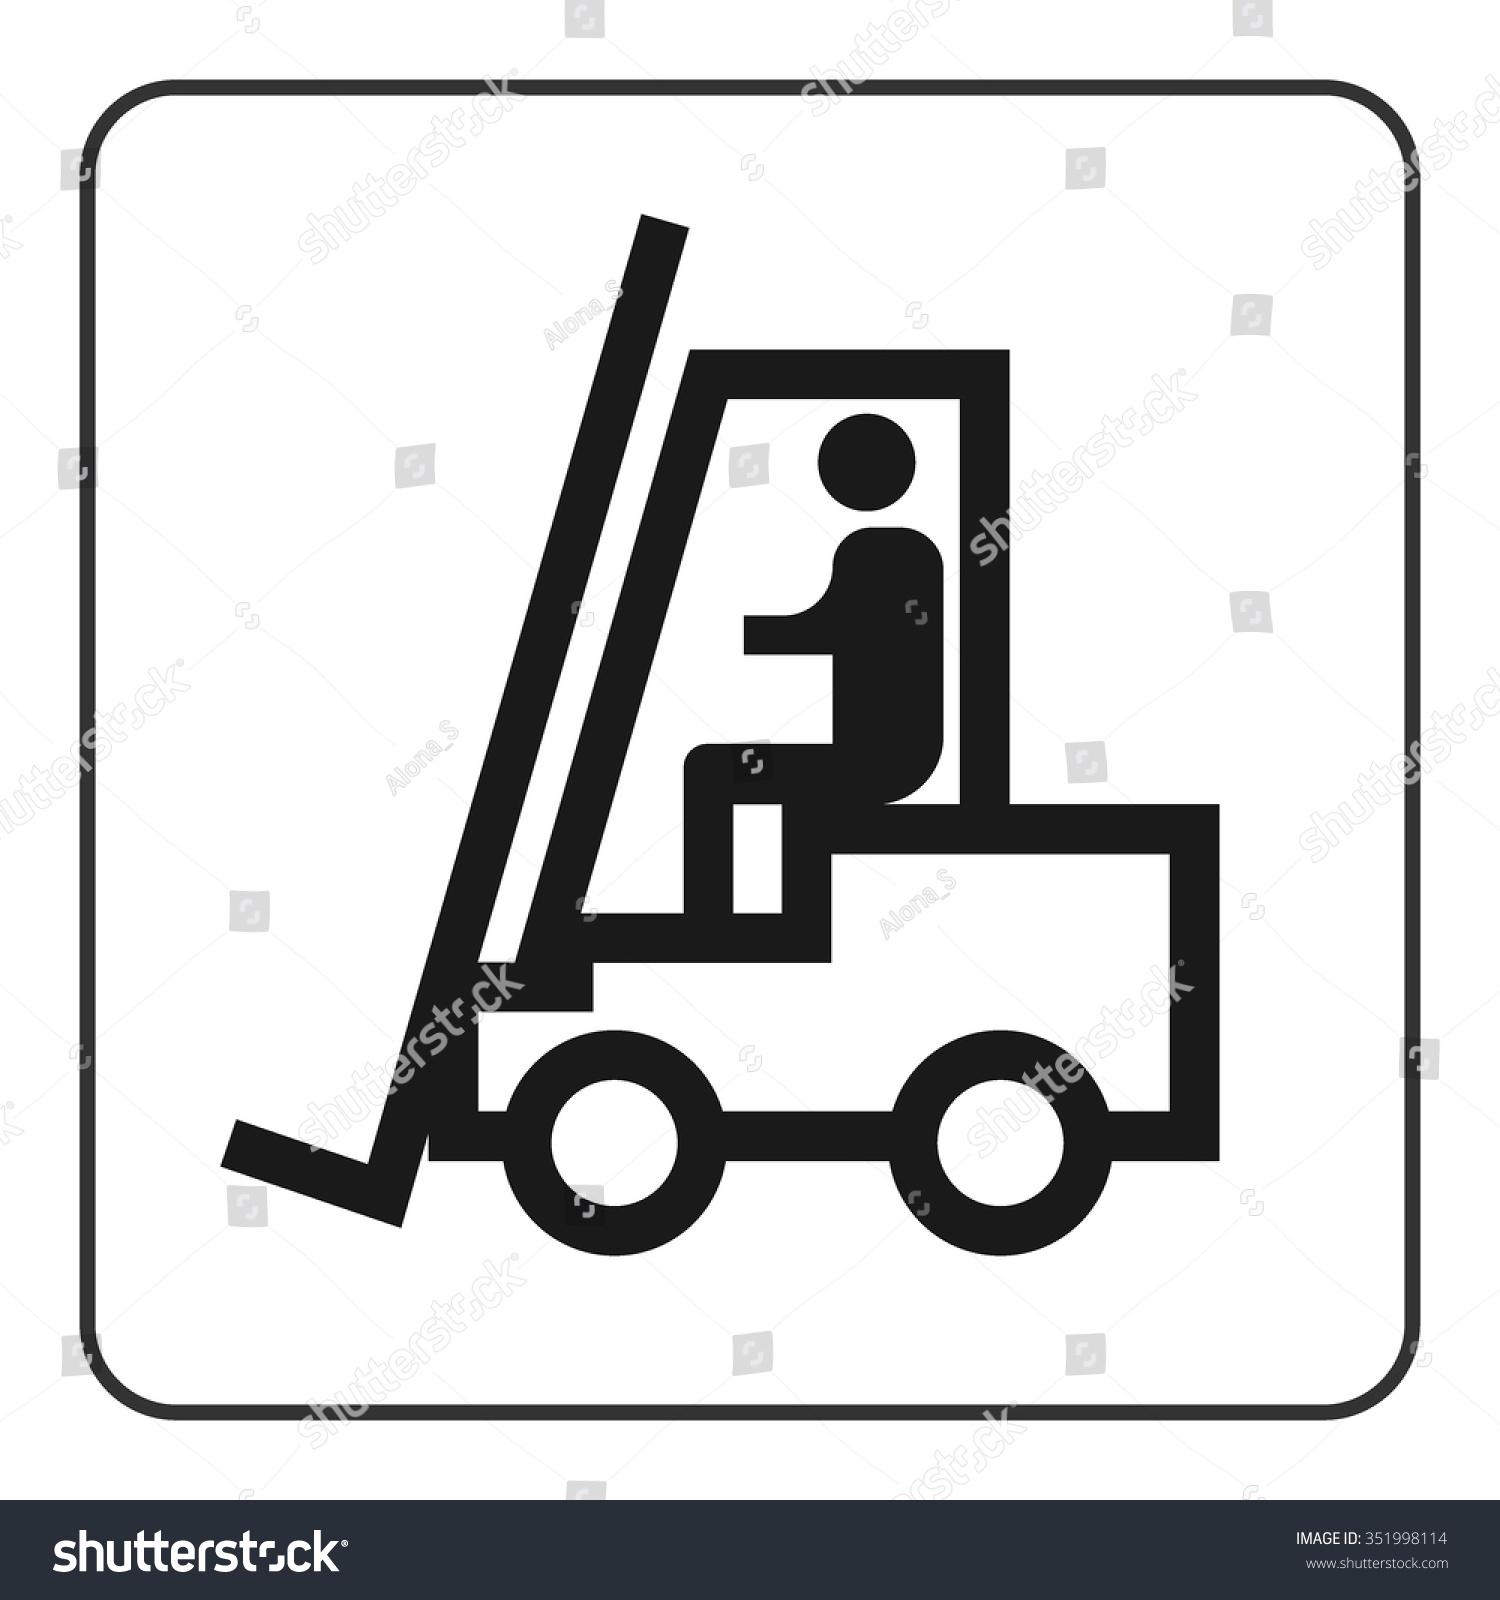 forklift truck sign black lifttruck icon stock vector. Black Bedroom Furniture Sets. Home Design Ideas